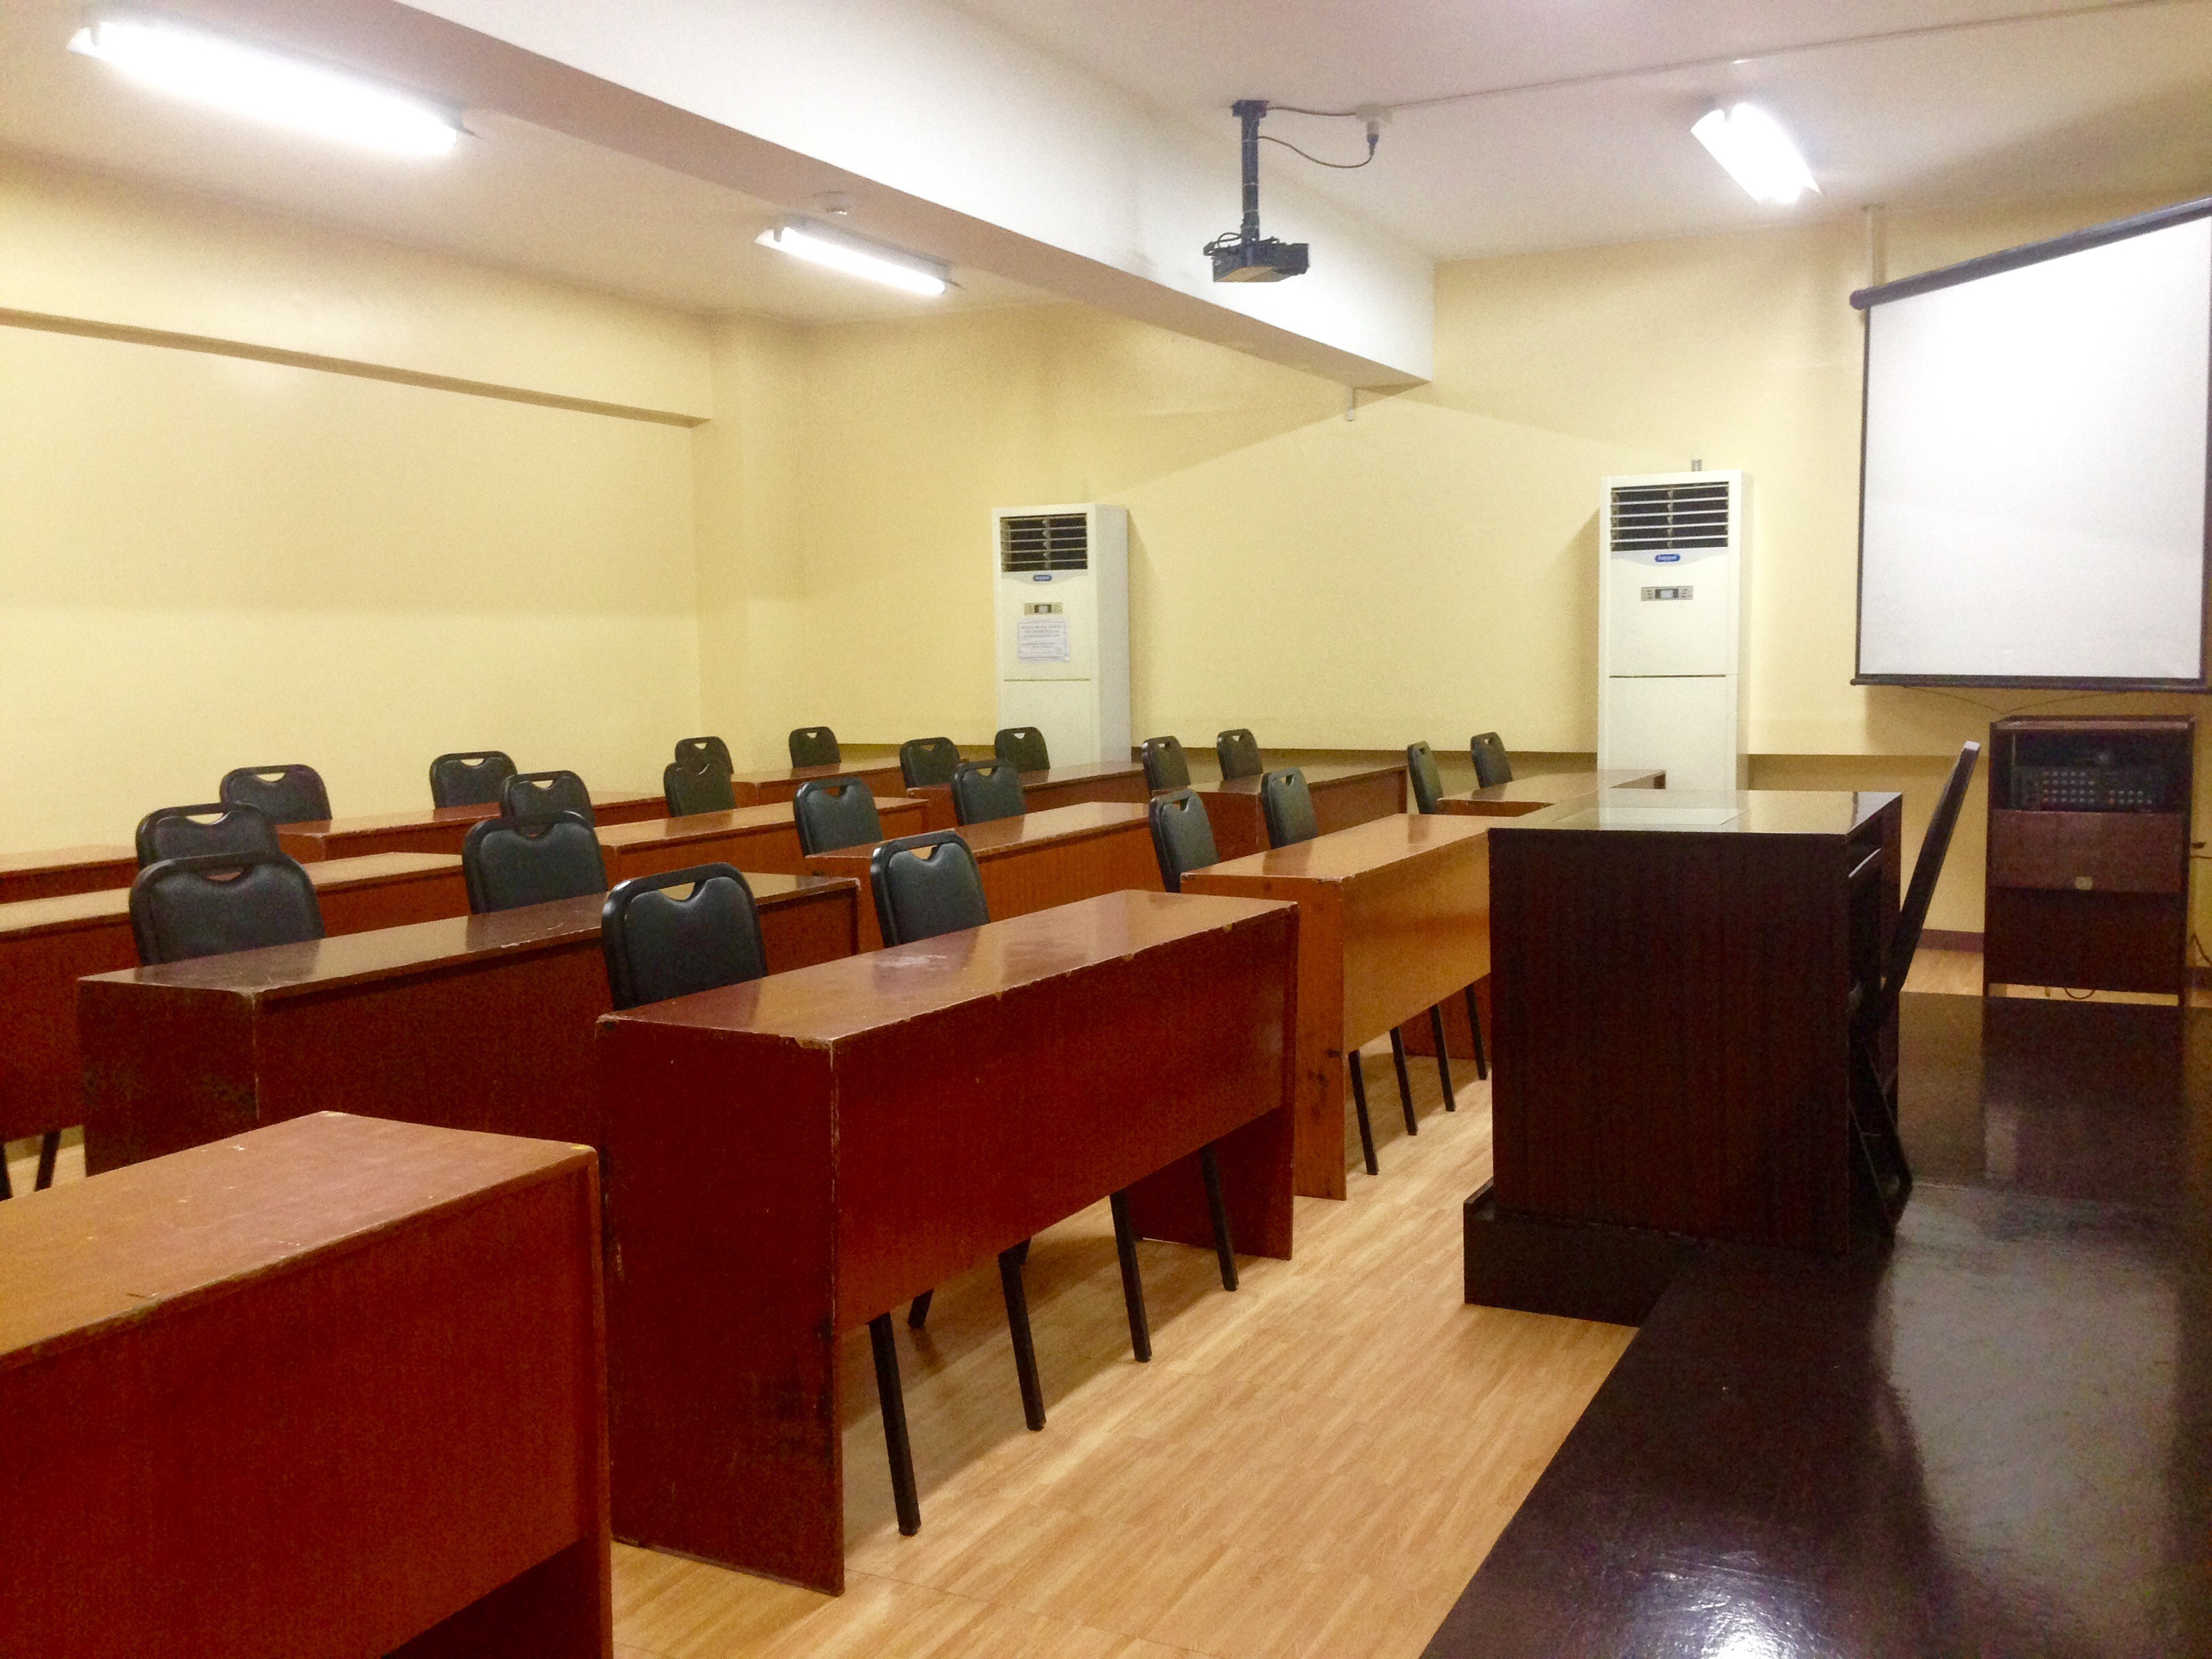 School of Law – Classroom 1